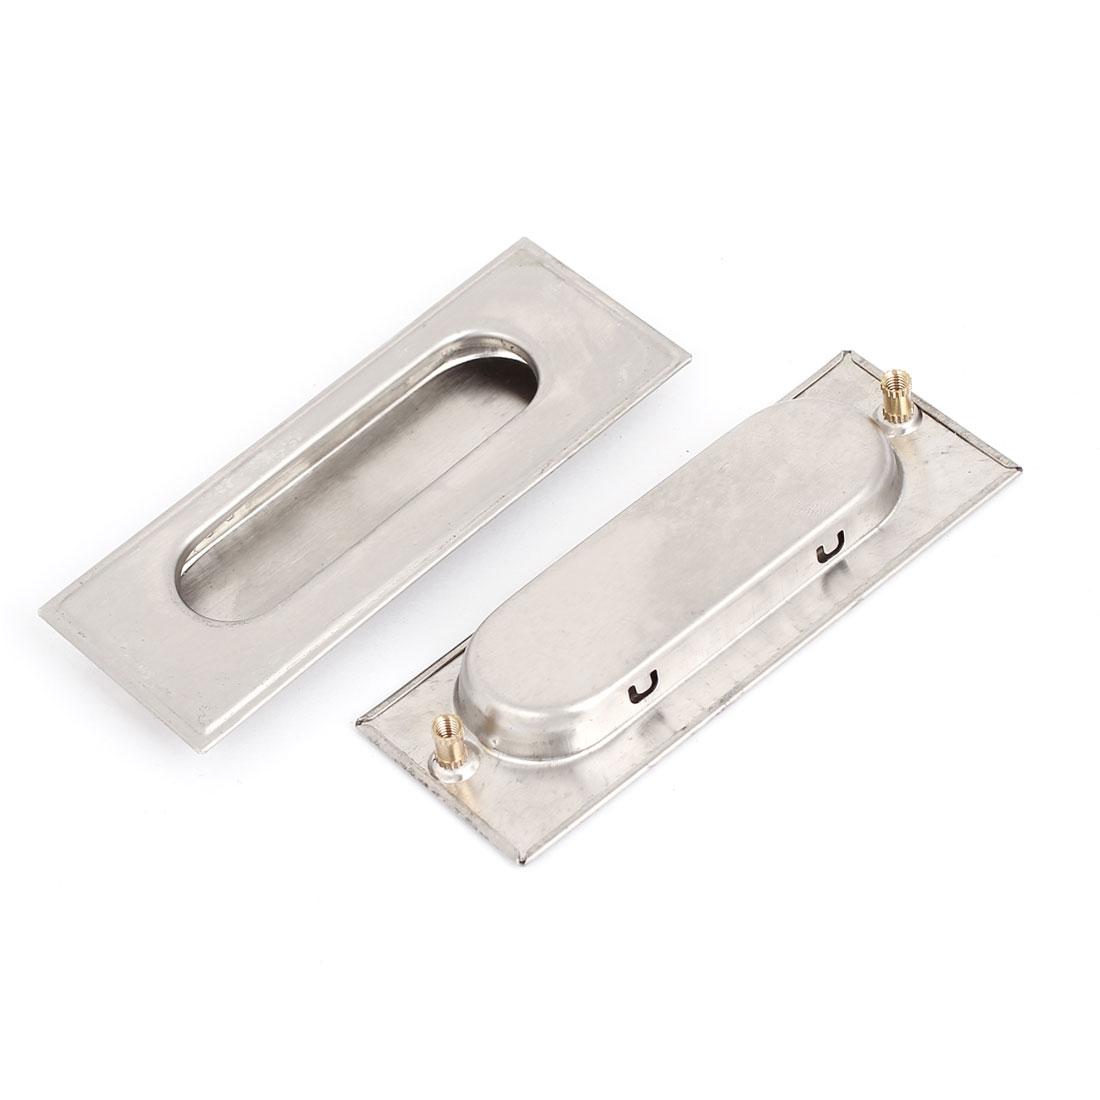 Rectangle Metal Recessed Cupboard Door Flush Pull Handle Hardware 108 x 41mm 2Pcs